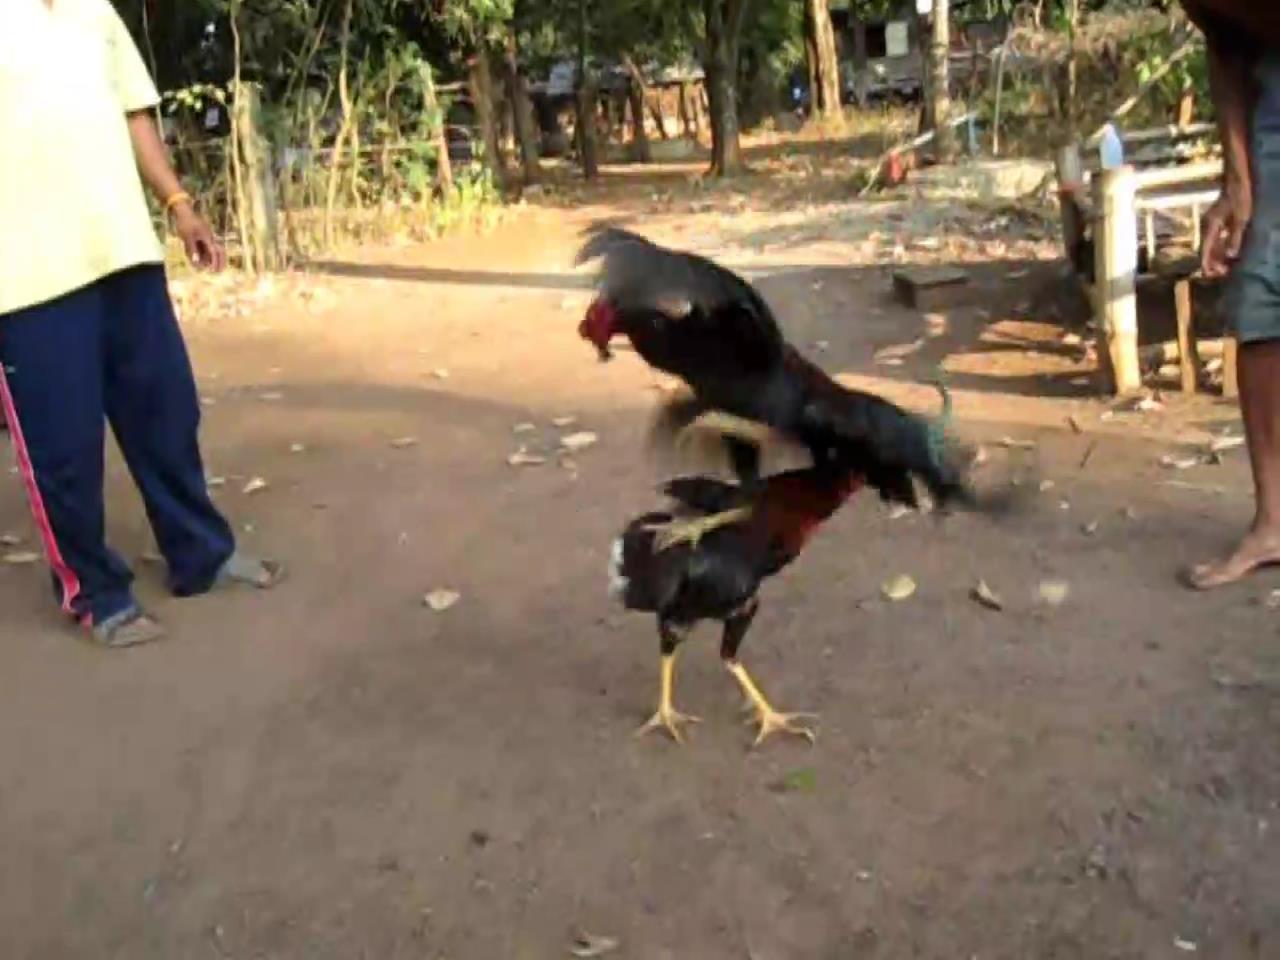 YouTube bans cockfighting video